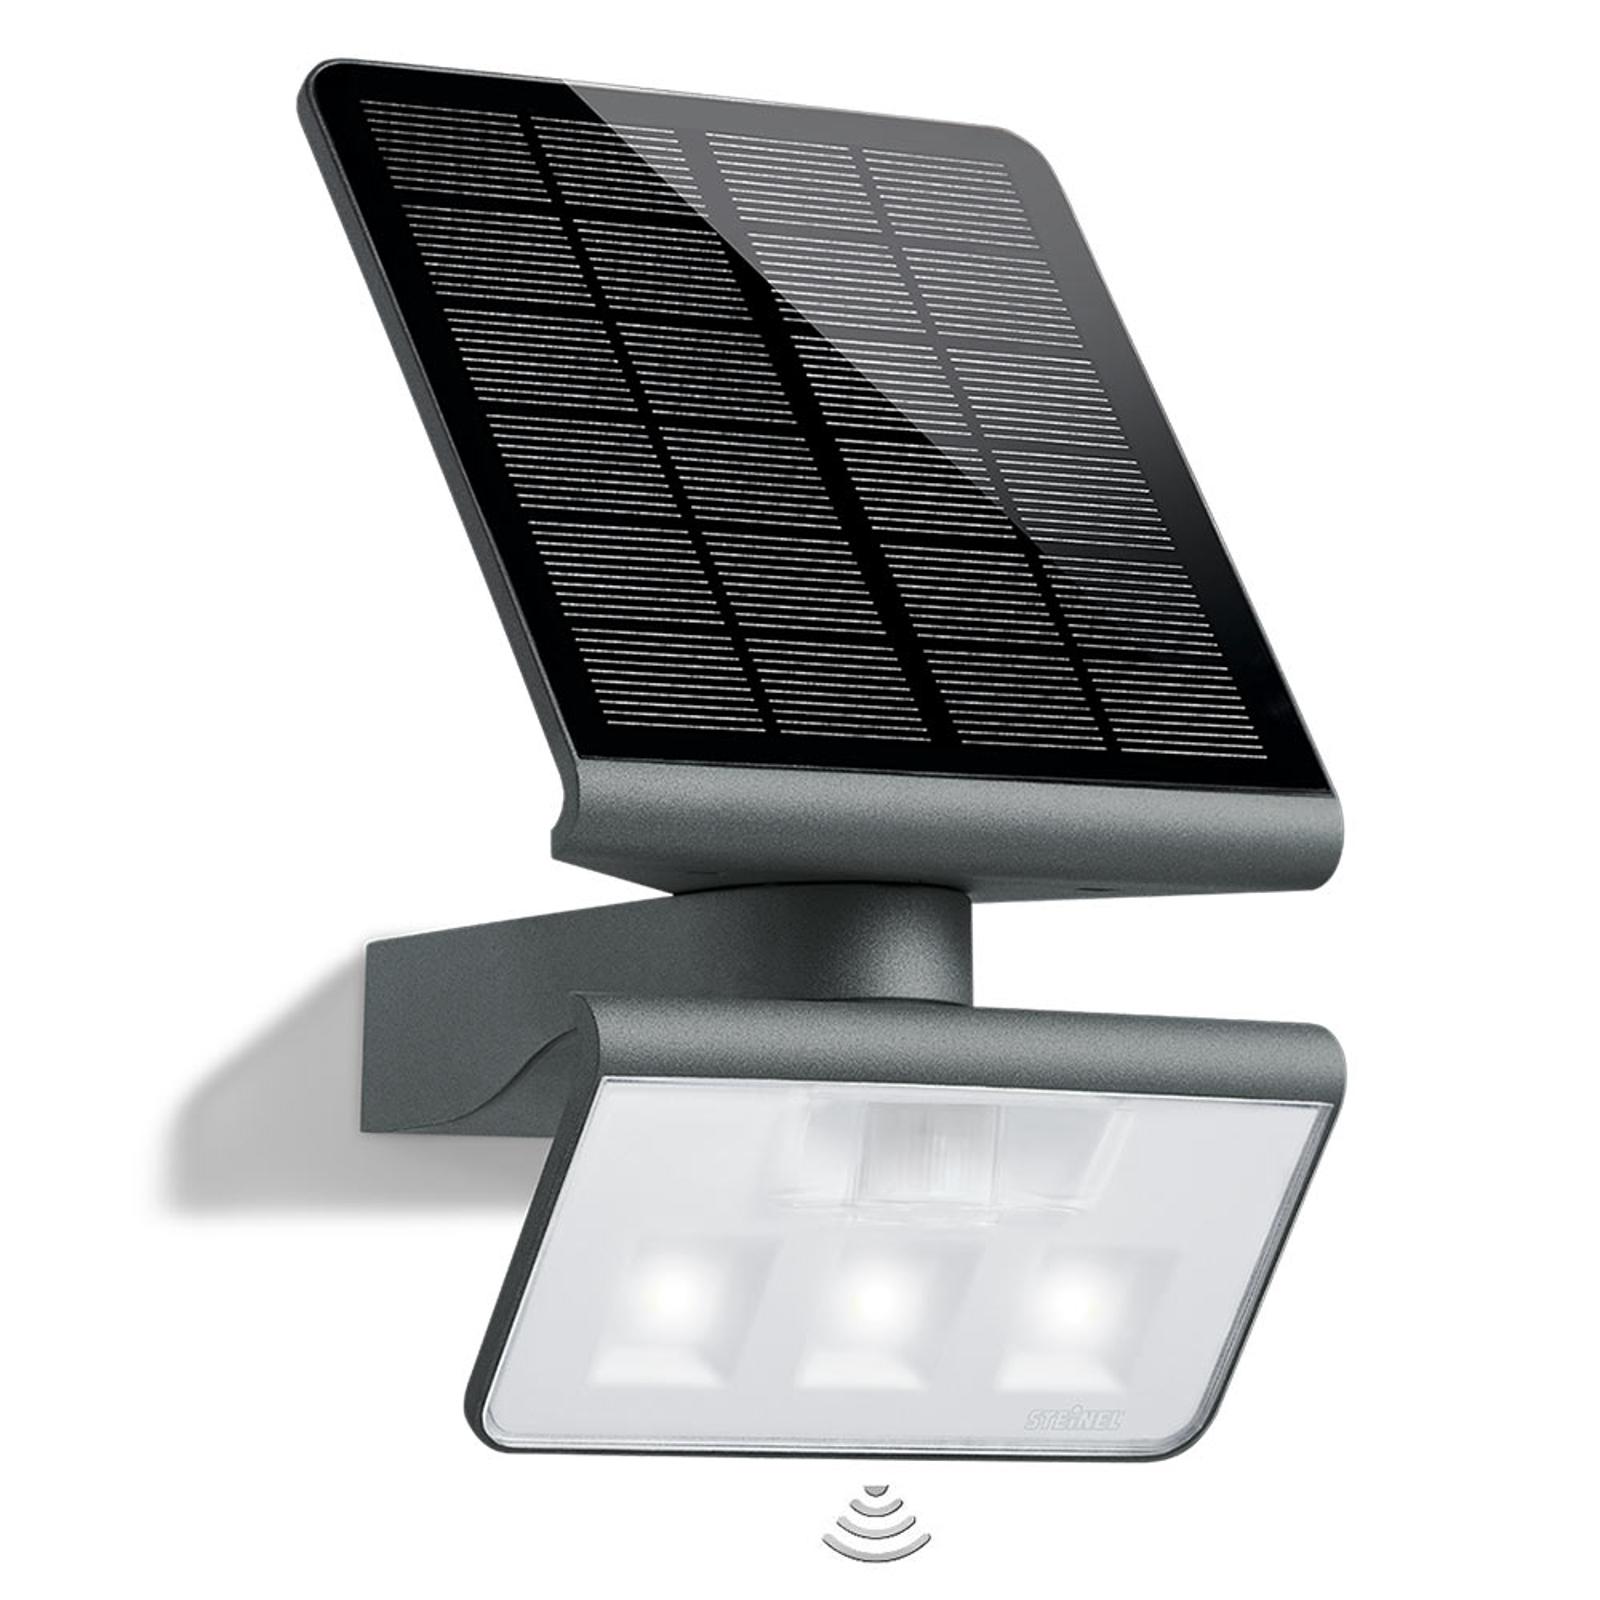 Spot LED STEINEL XSolar L-S Professional a sensore